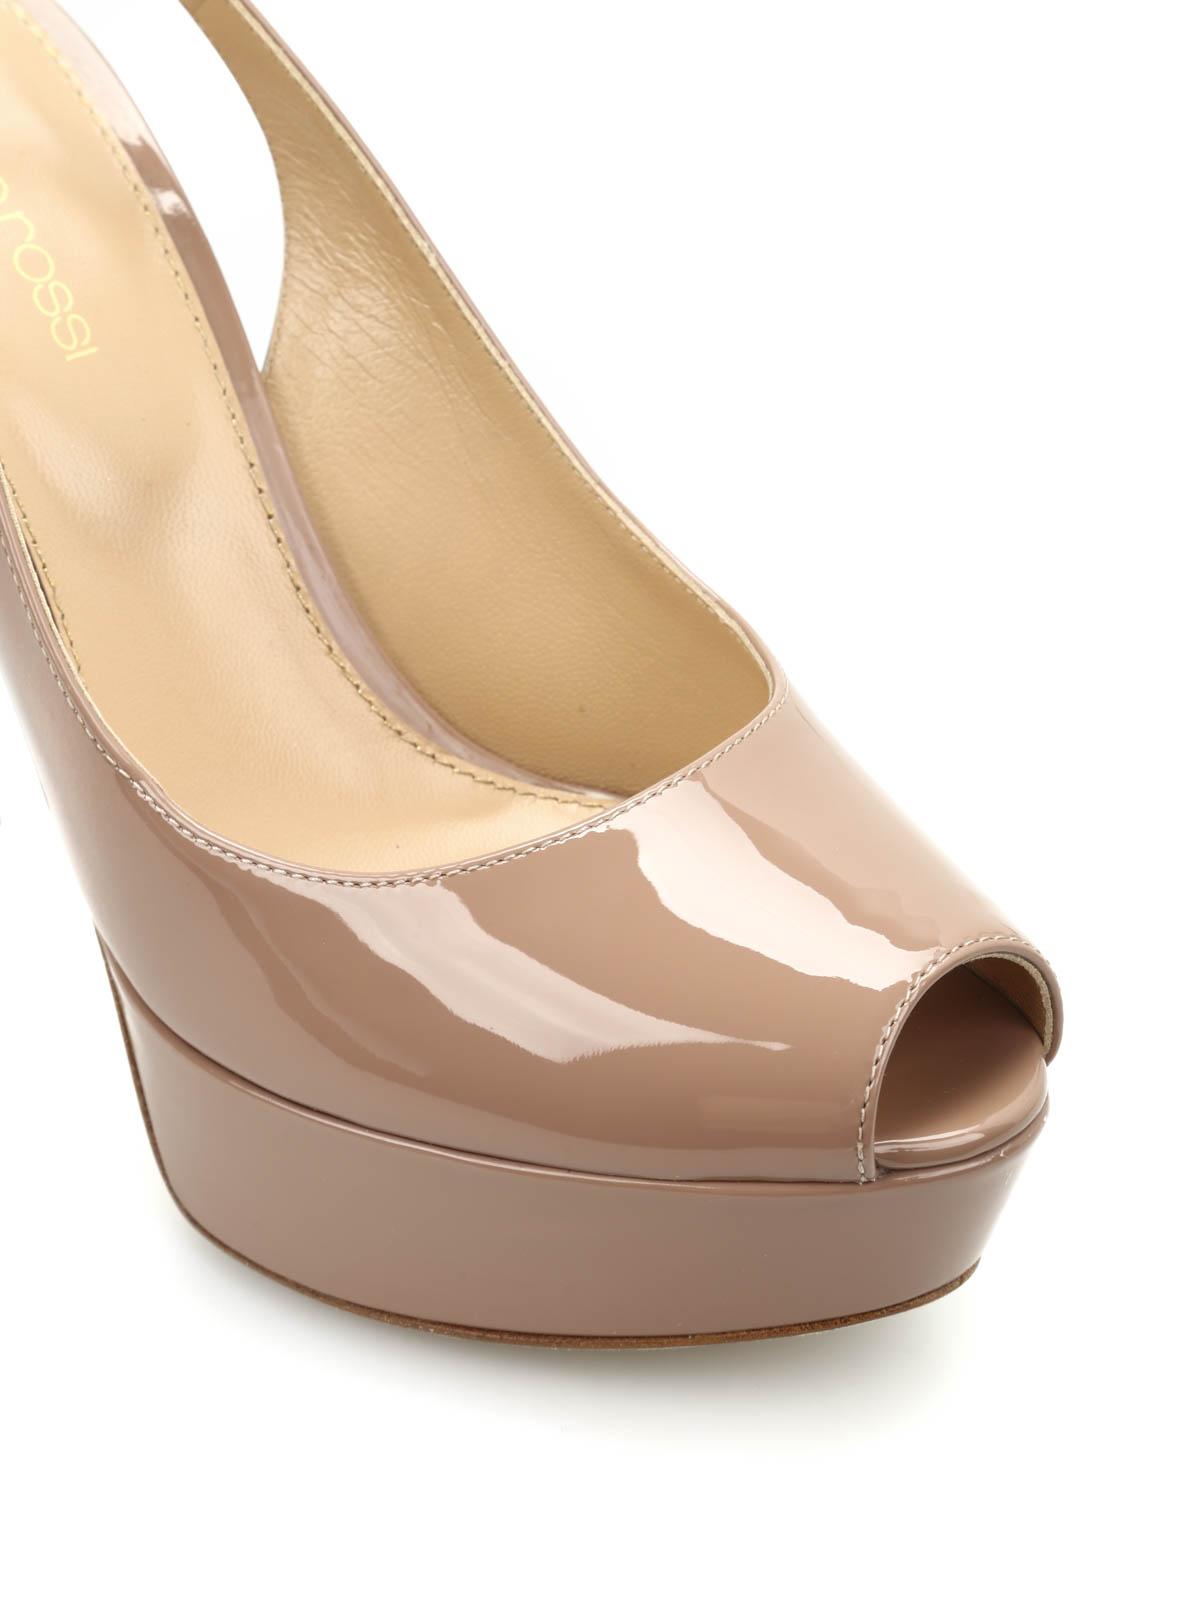 alton sandals by sergio rossi sandals ikrix. Black Bedroom Furniture Sets. Home Design Ideas